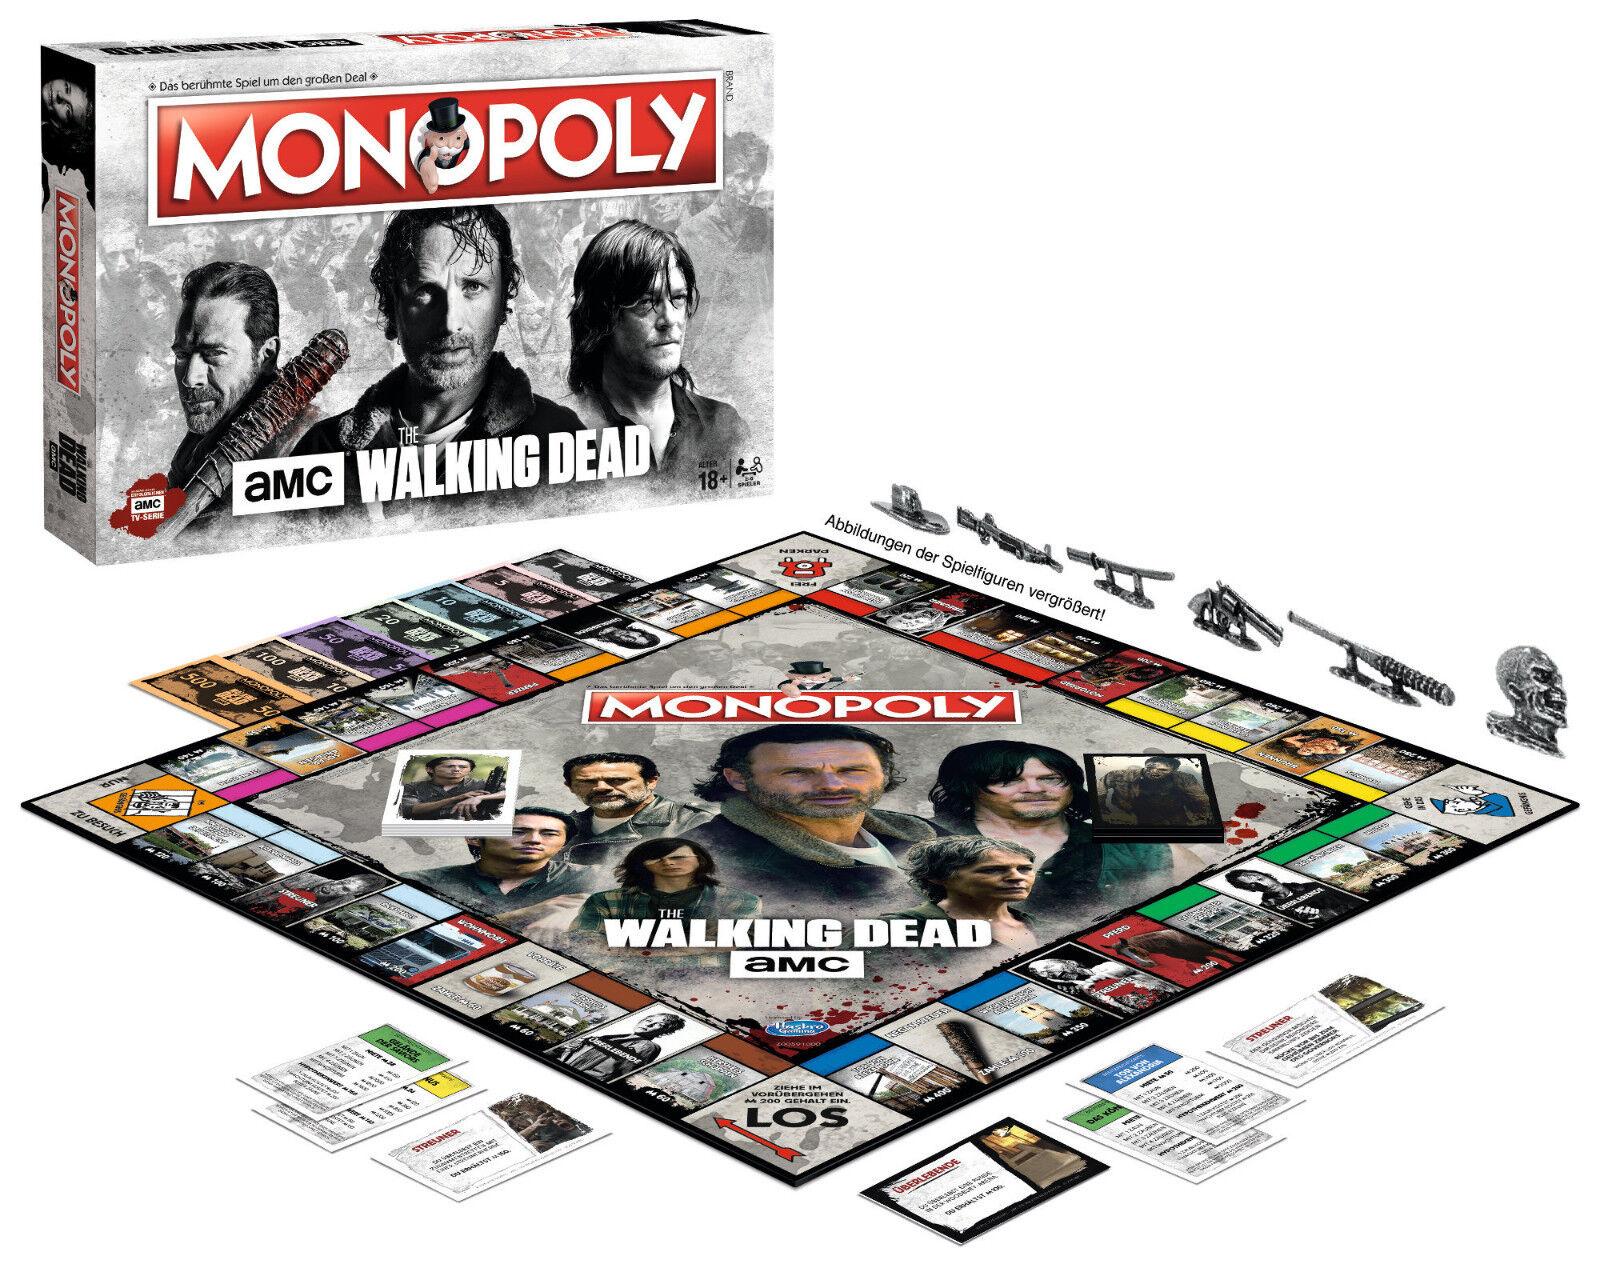 MONOPOLY - THE WALKING DEAD AMC AMC AMC - Winning Moves 45359 - NEU 241ffd